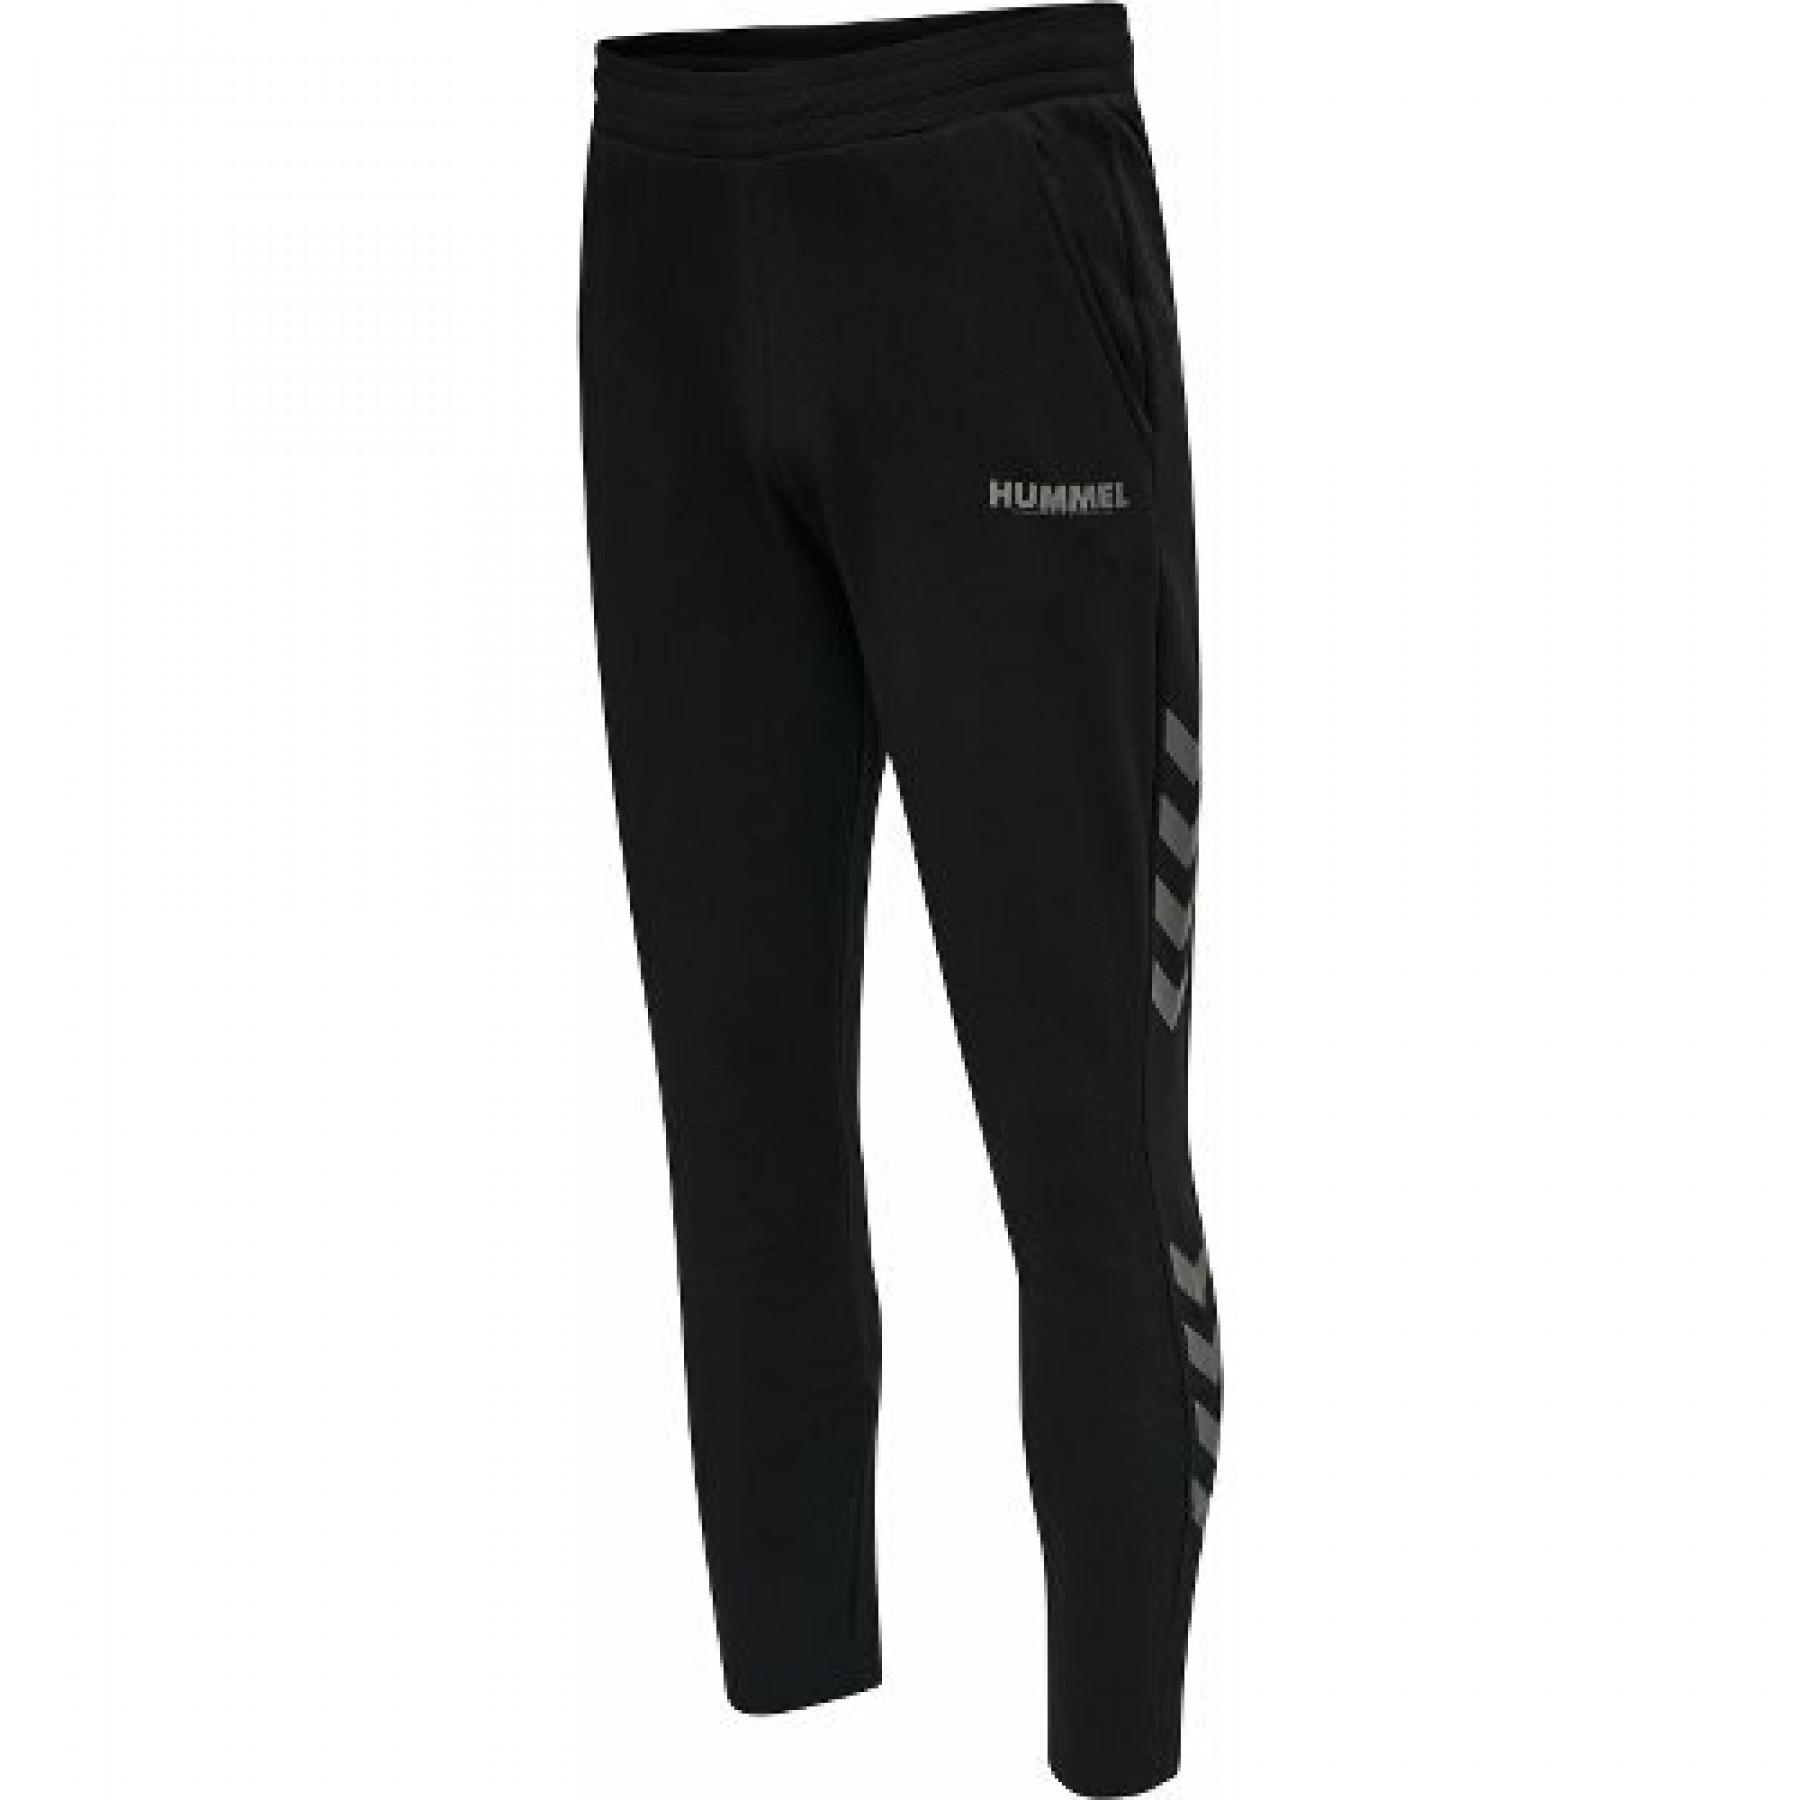 Hummel Legacy tapered pants